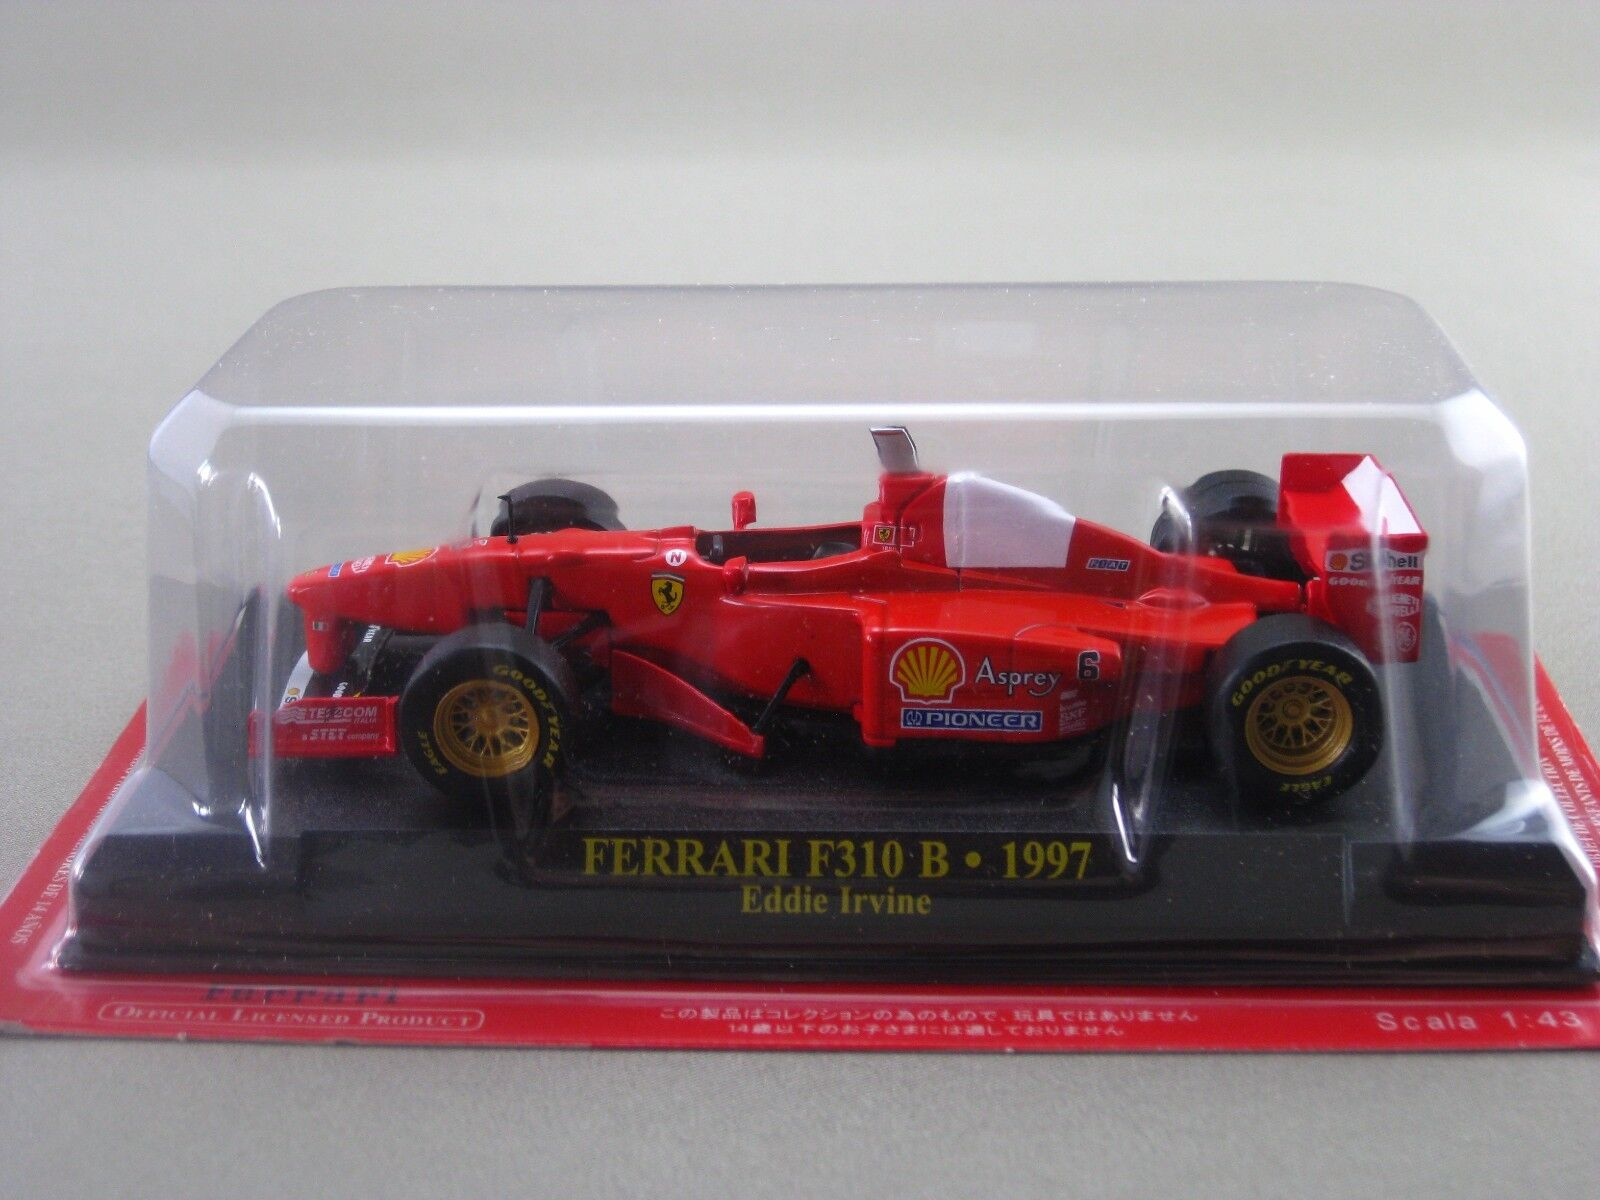 Ferrari F310 B EDDIE IRVINE 1997 hachette 1:43 Diecast Model Car Vol.50